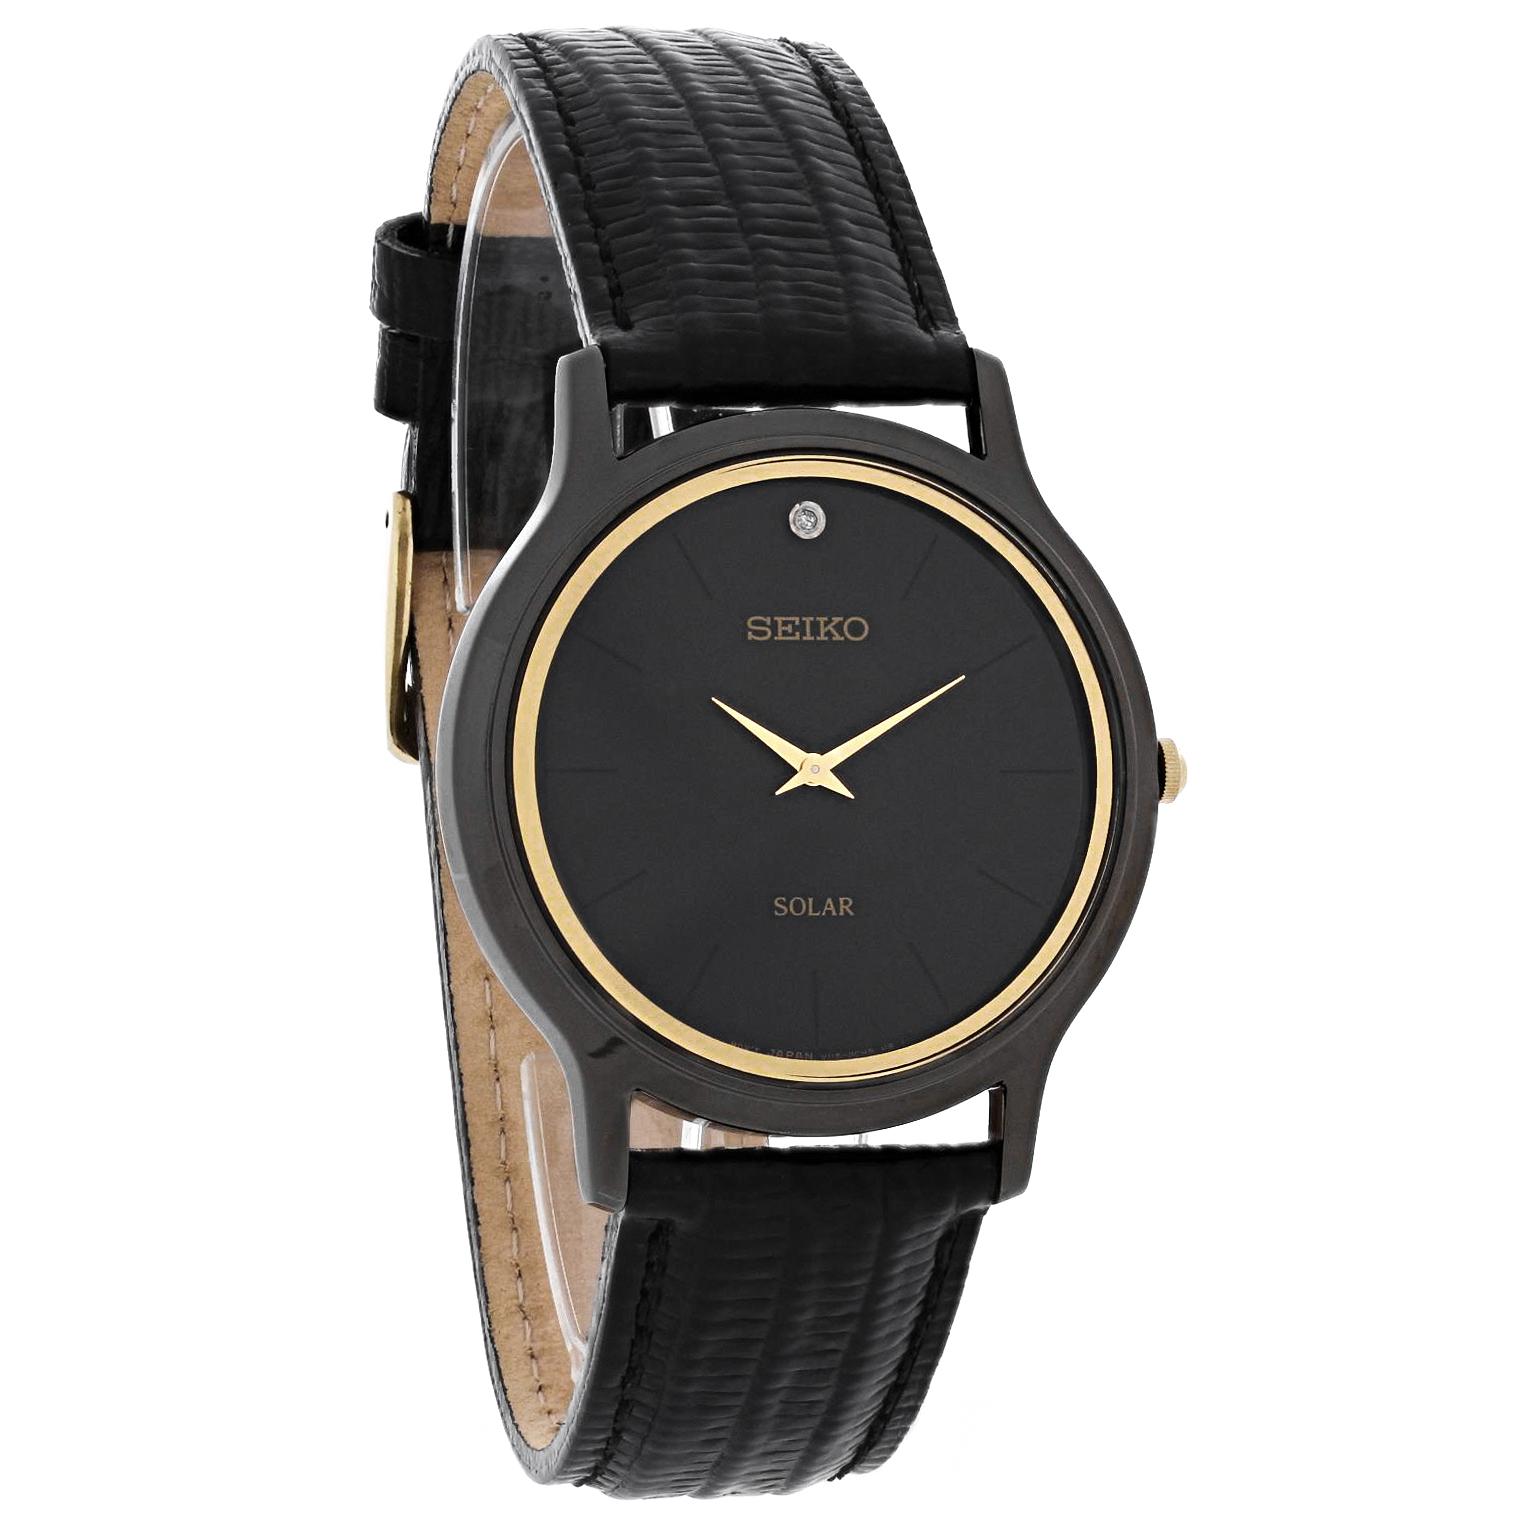 Seiko solar mens diamond black ion leather strap watch sup875 ebay for Black leather strap men